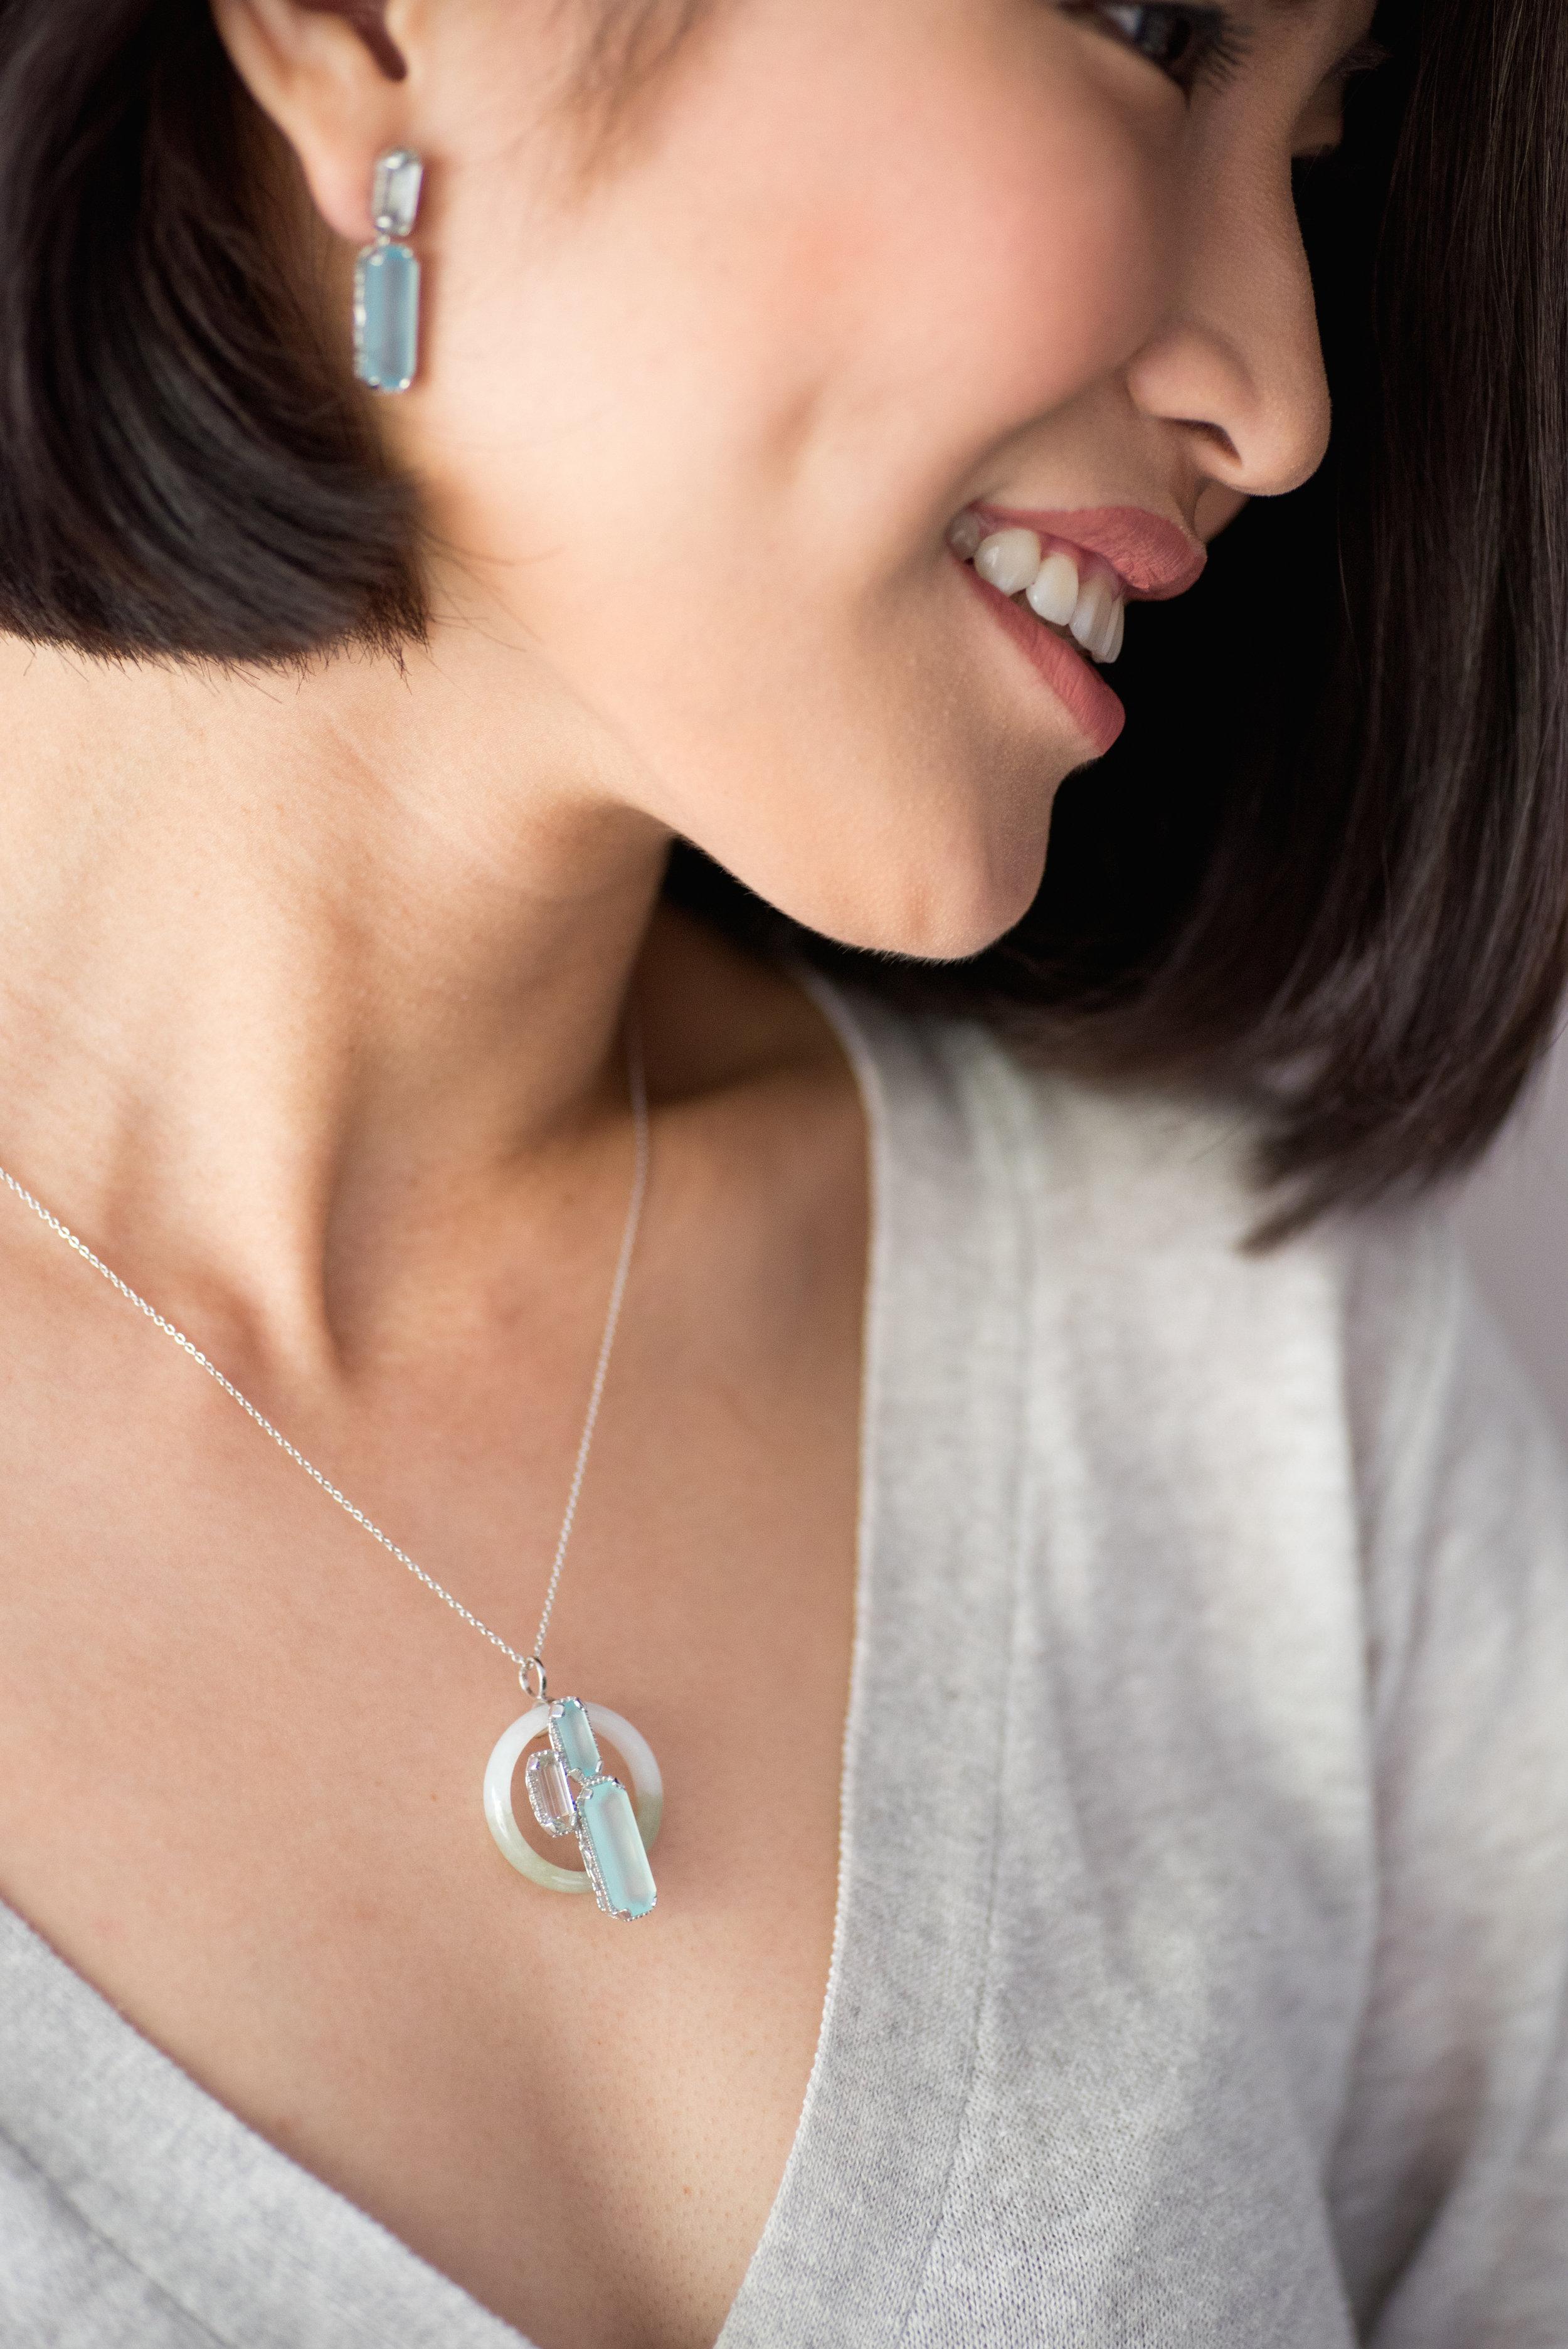 Choo Yilin Shophouse Jade Necklace and Shophouse Gemstone Earrings